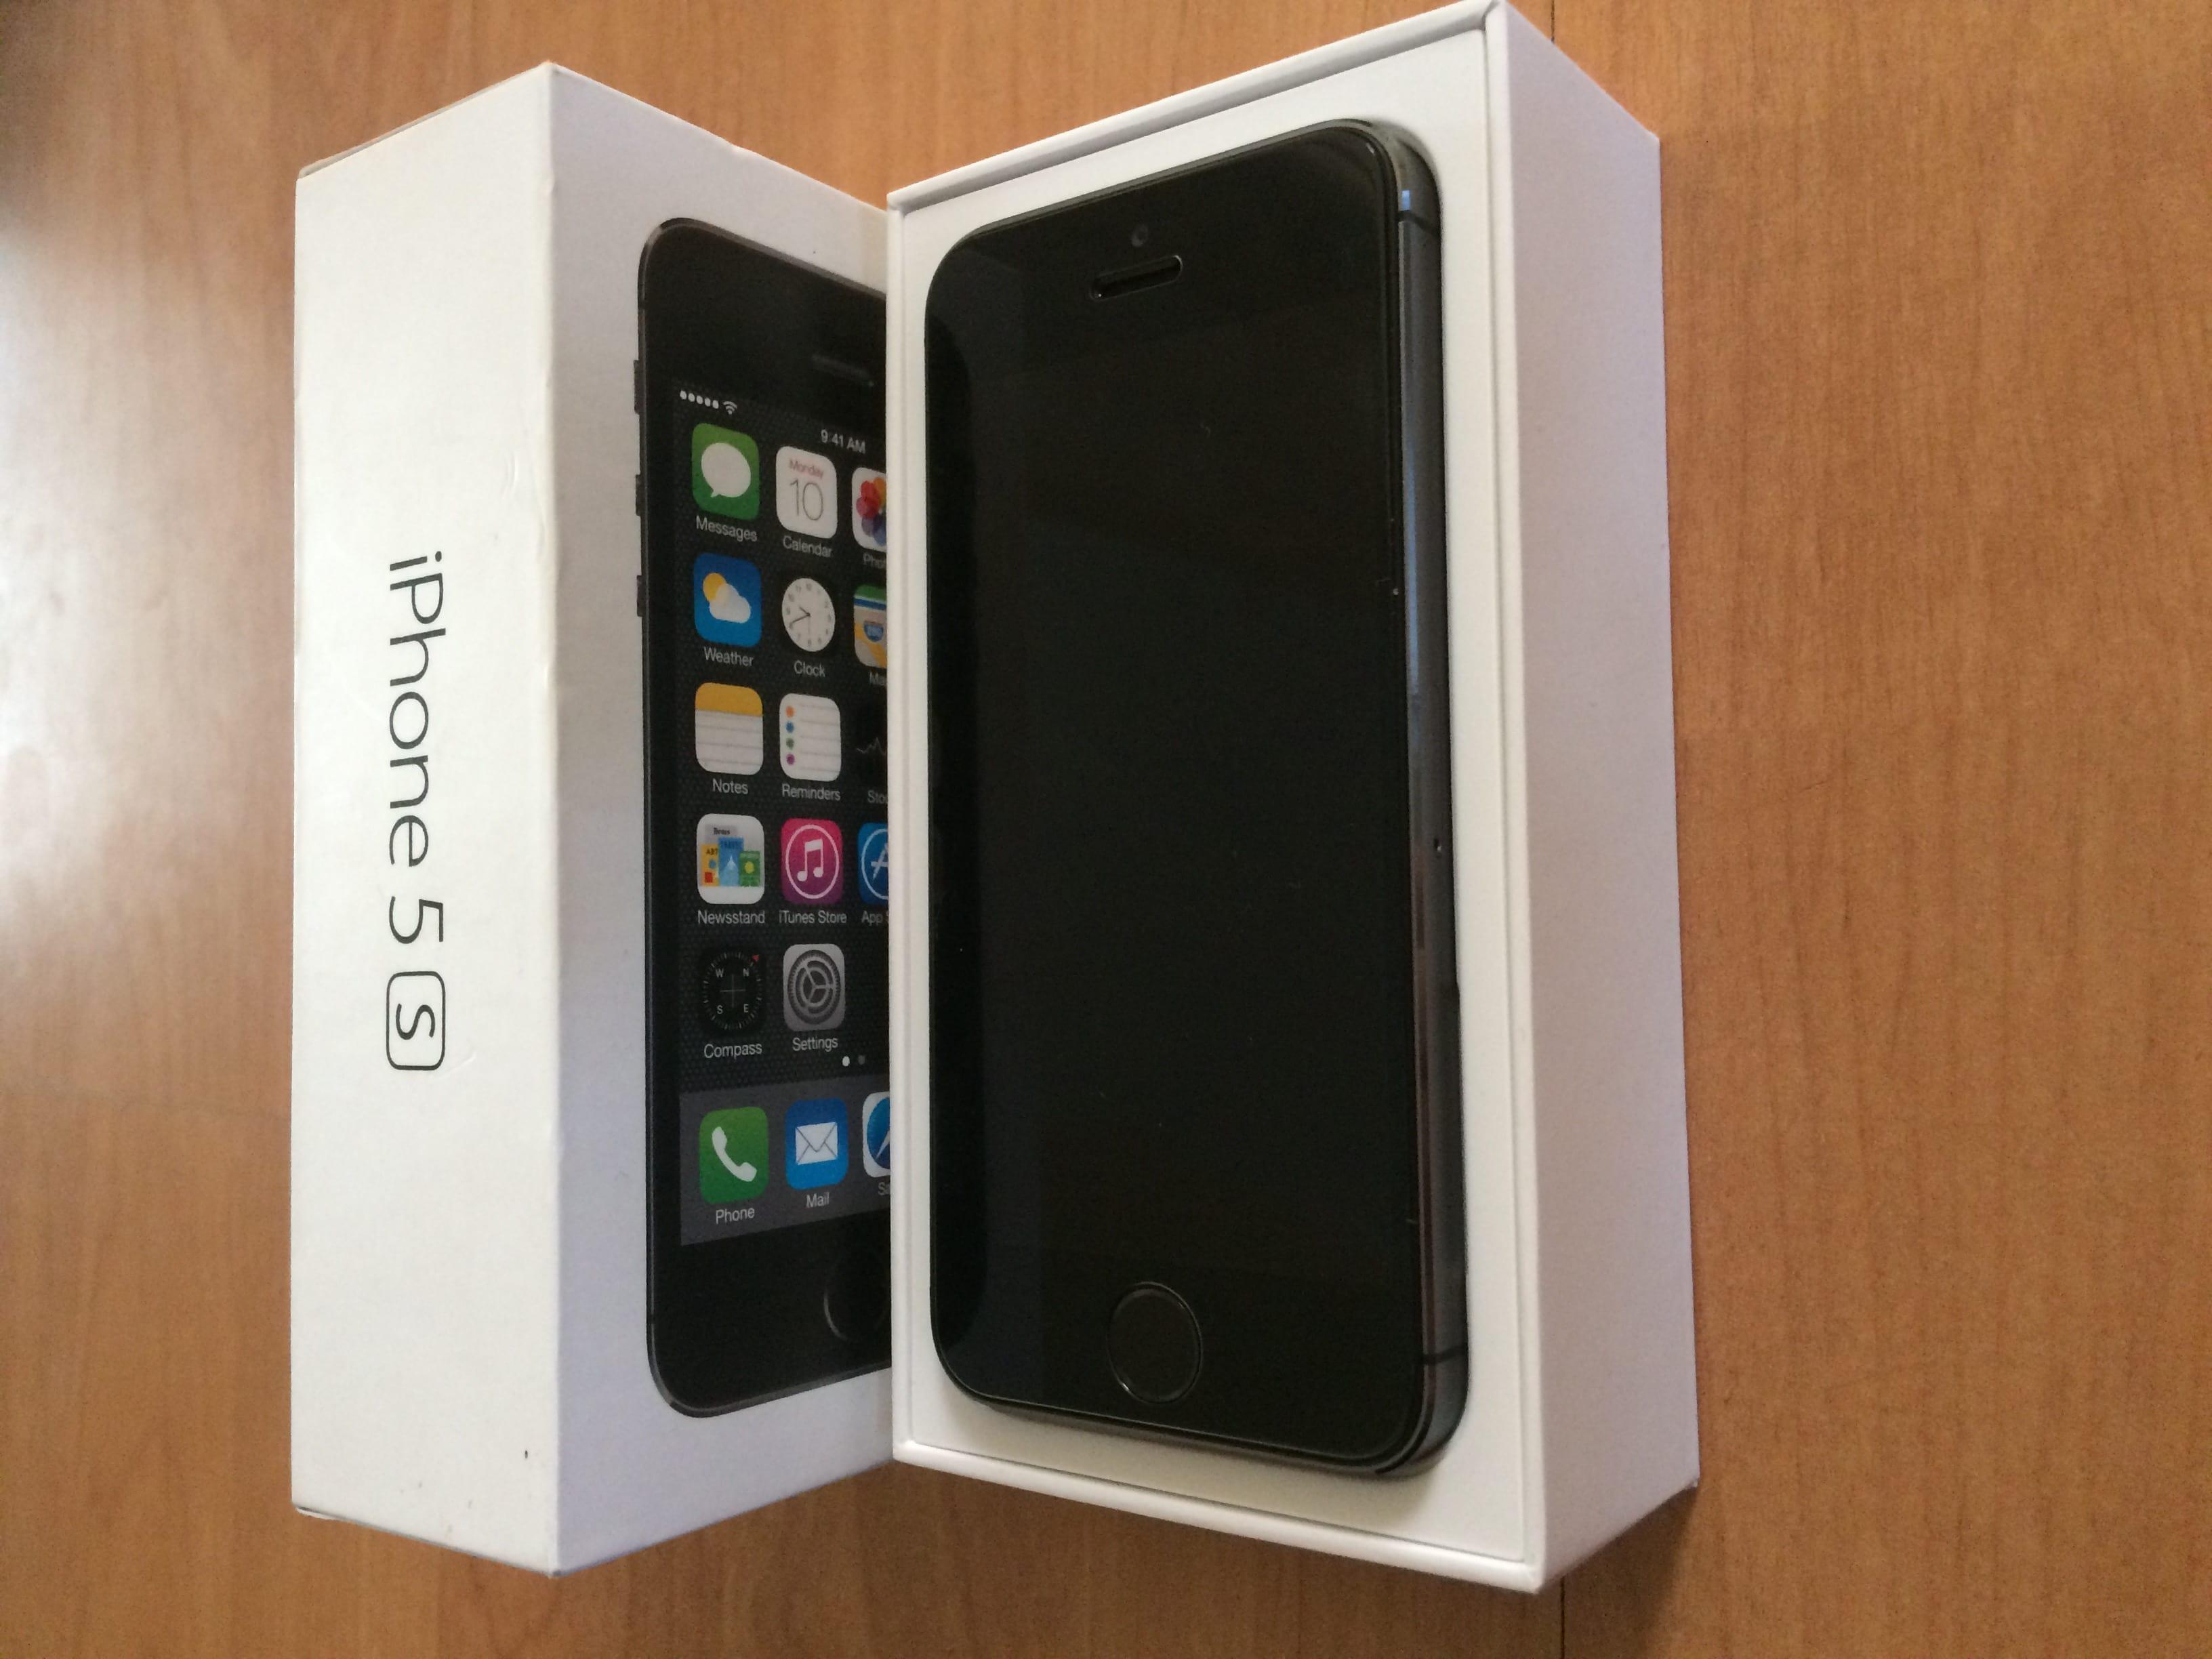 Zobraziť inzerát ~ MacBlog.sk - iPhone - IPhone 5s 64gb 6c483bc3e1a